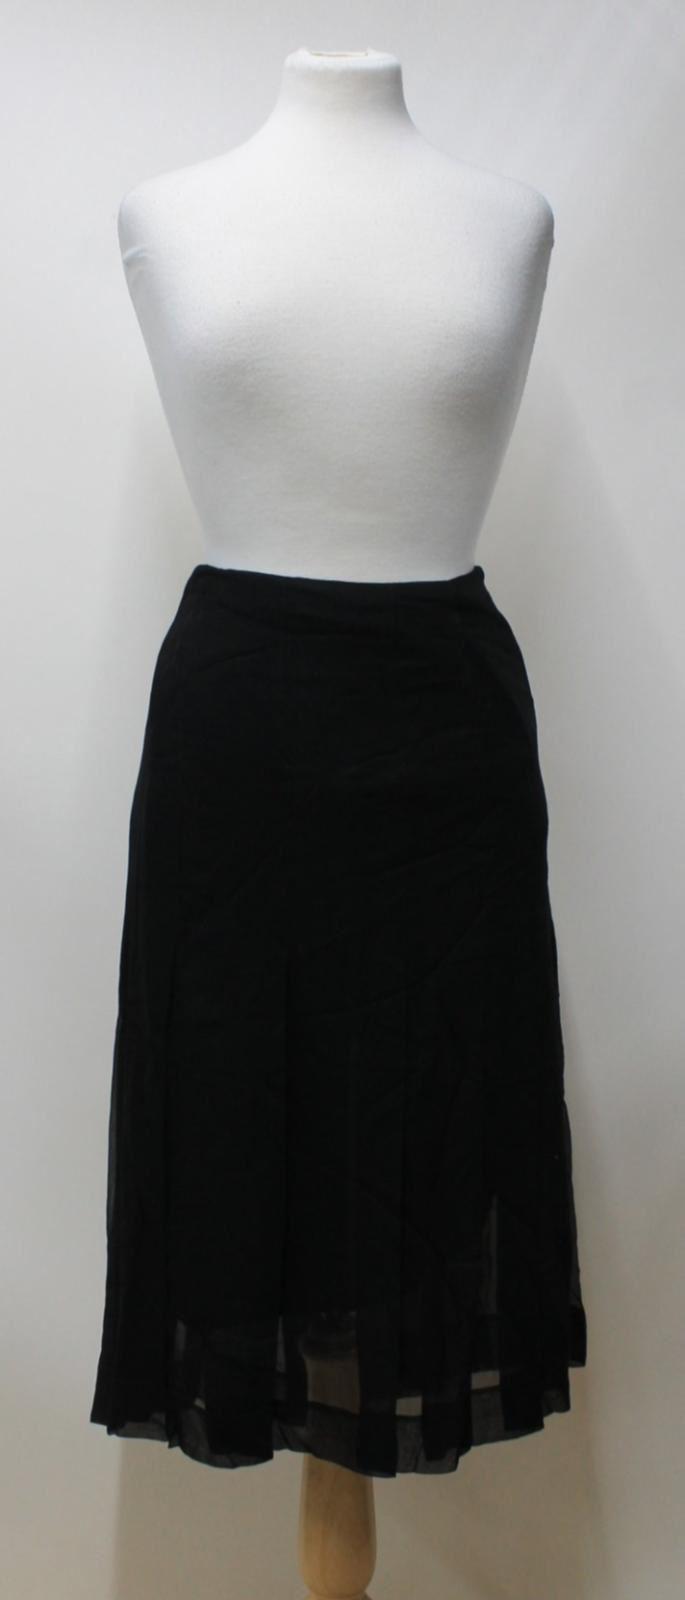 DONNA-KARAN-Signature-Ladies-Black-Chiffon-Silk-Pleated-Midi-Skirt-Size-UK14